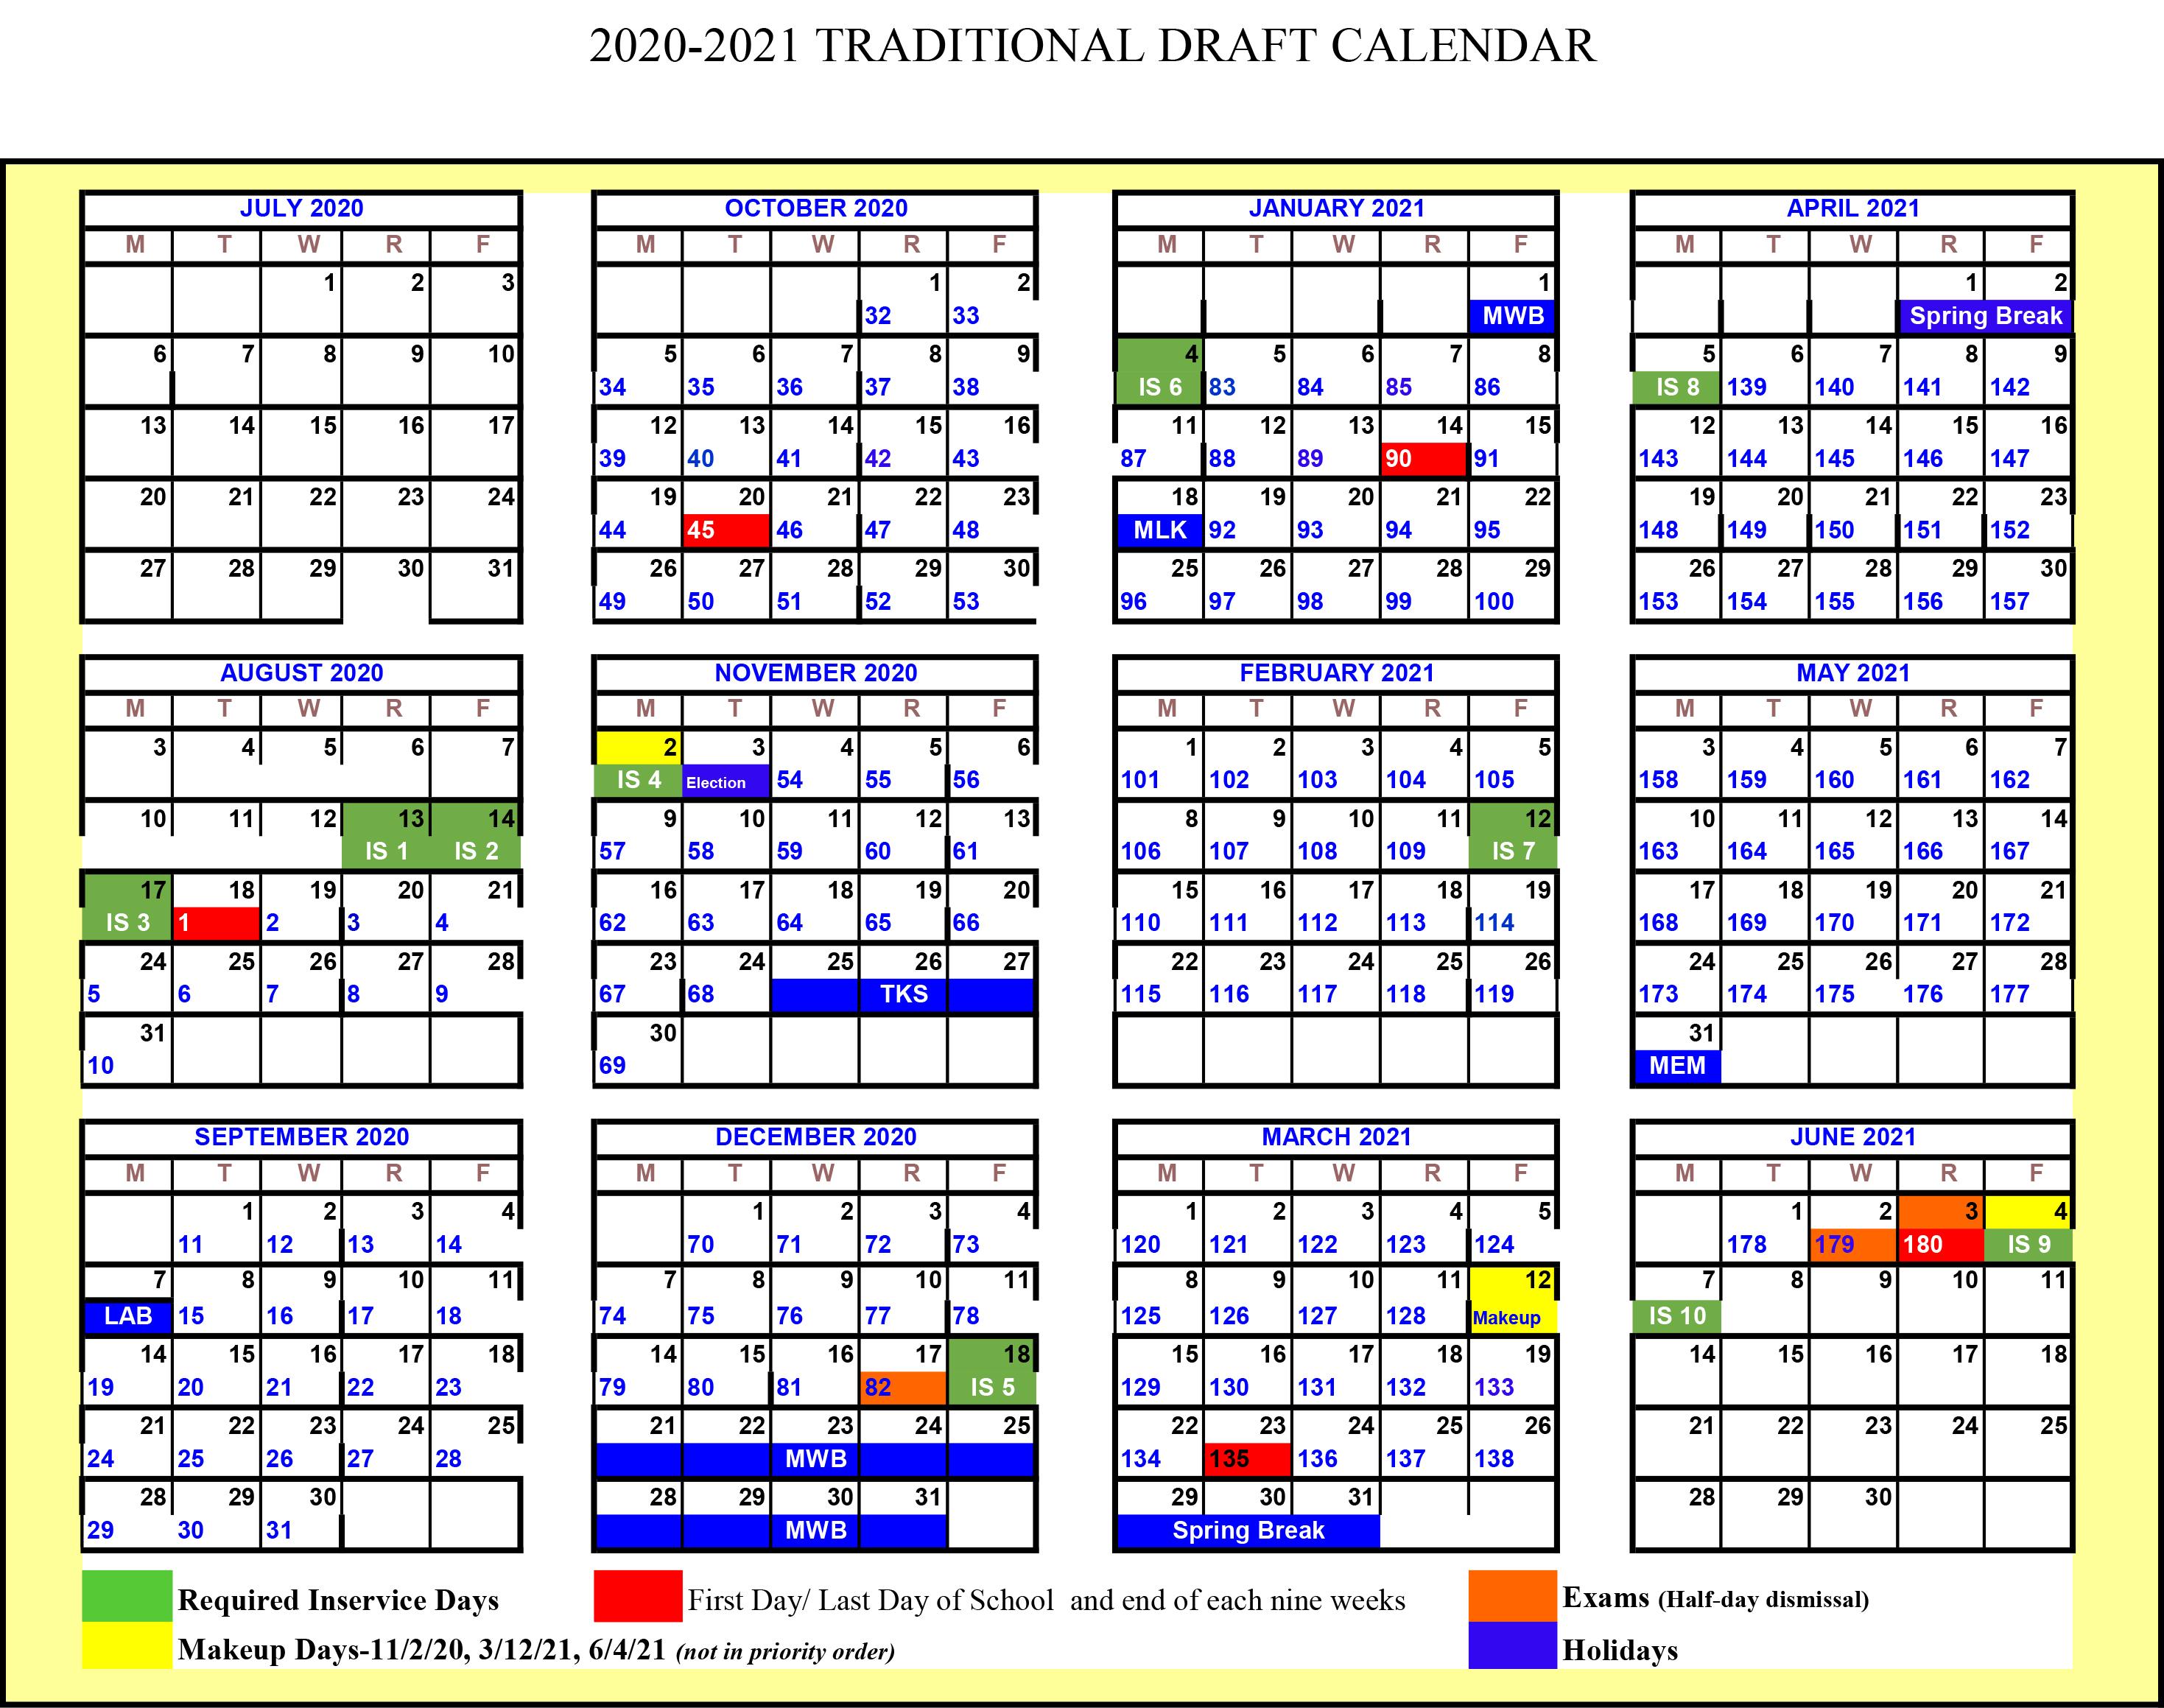 South Carolina School Calendar 2021-2022 Wallpaper